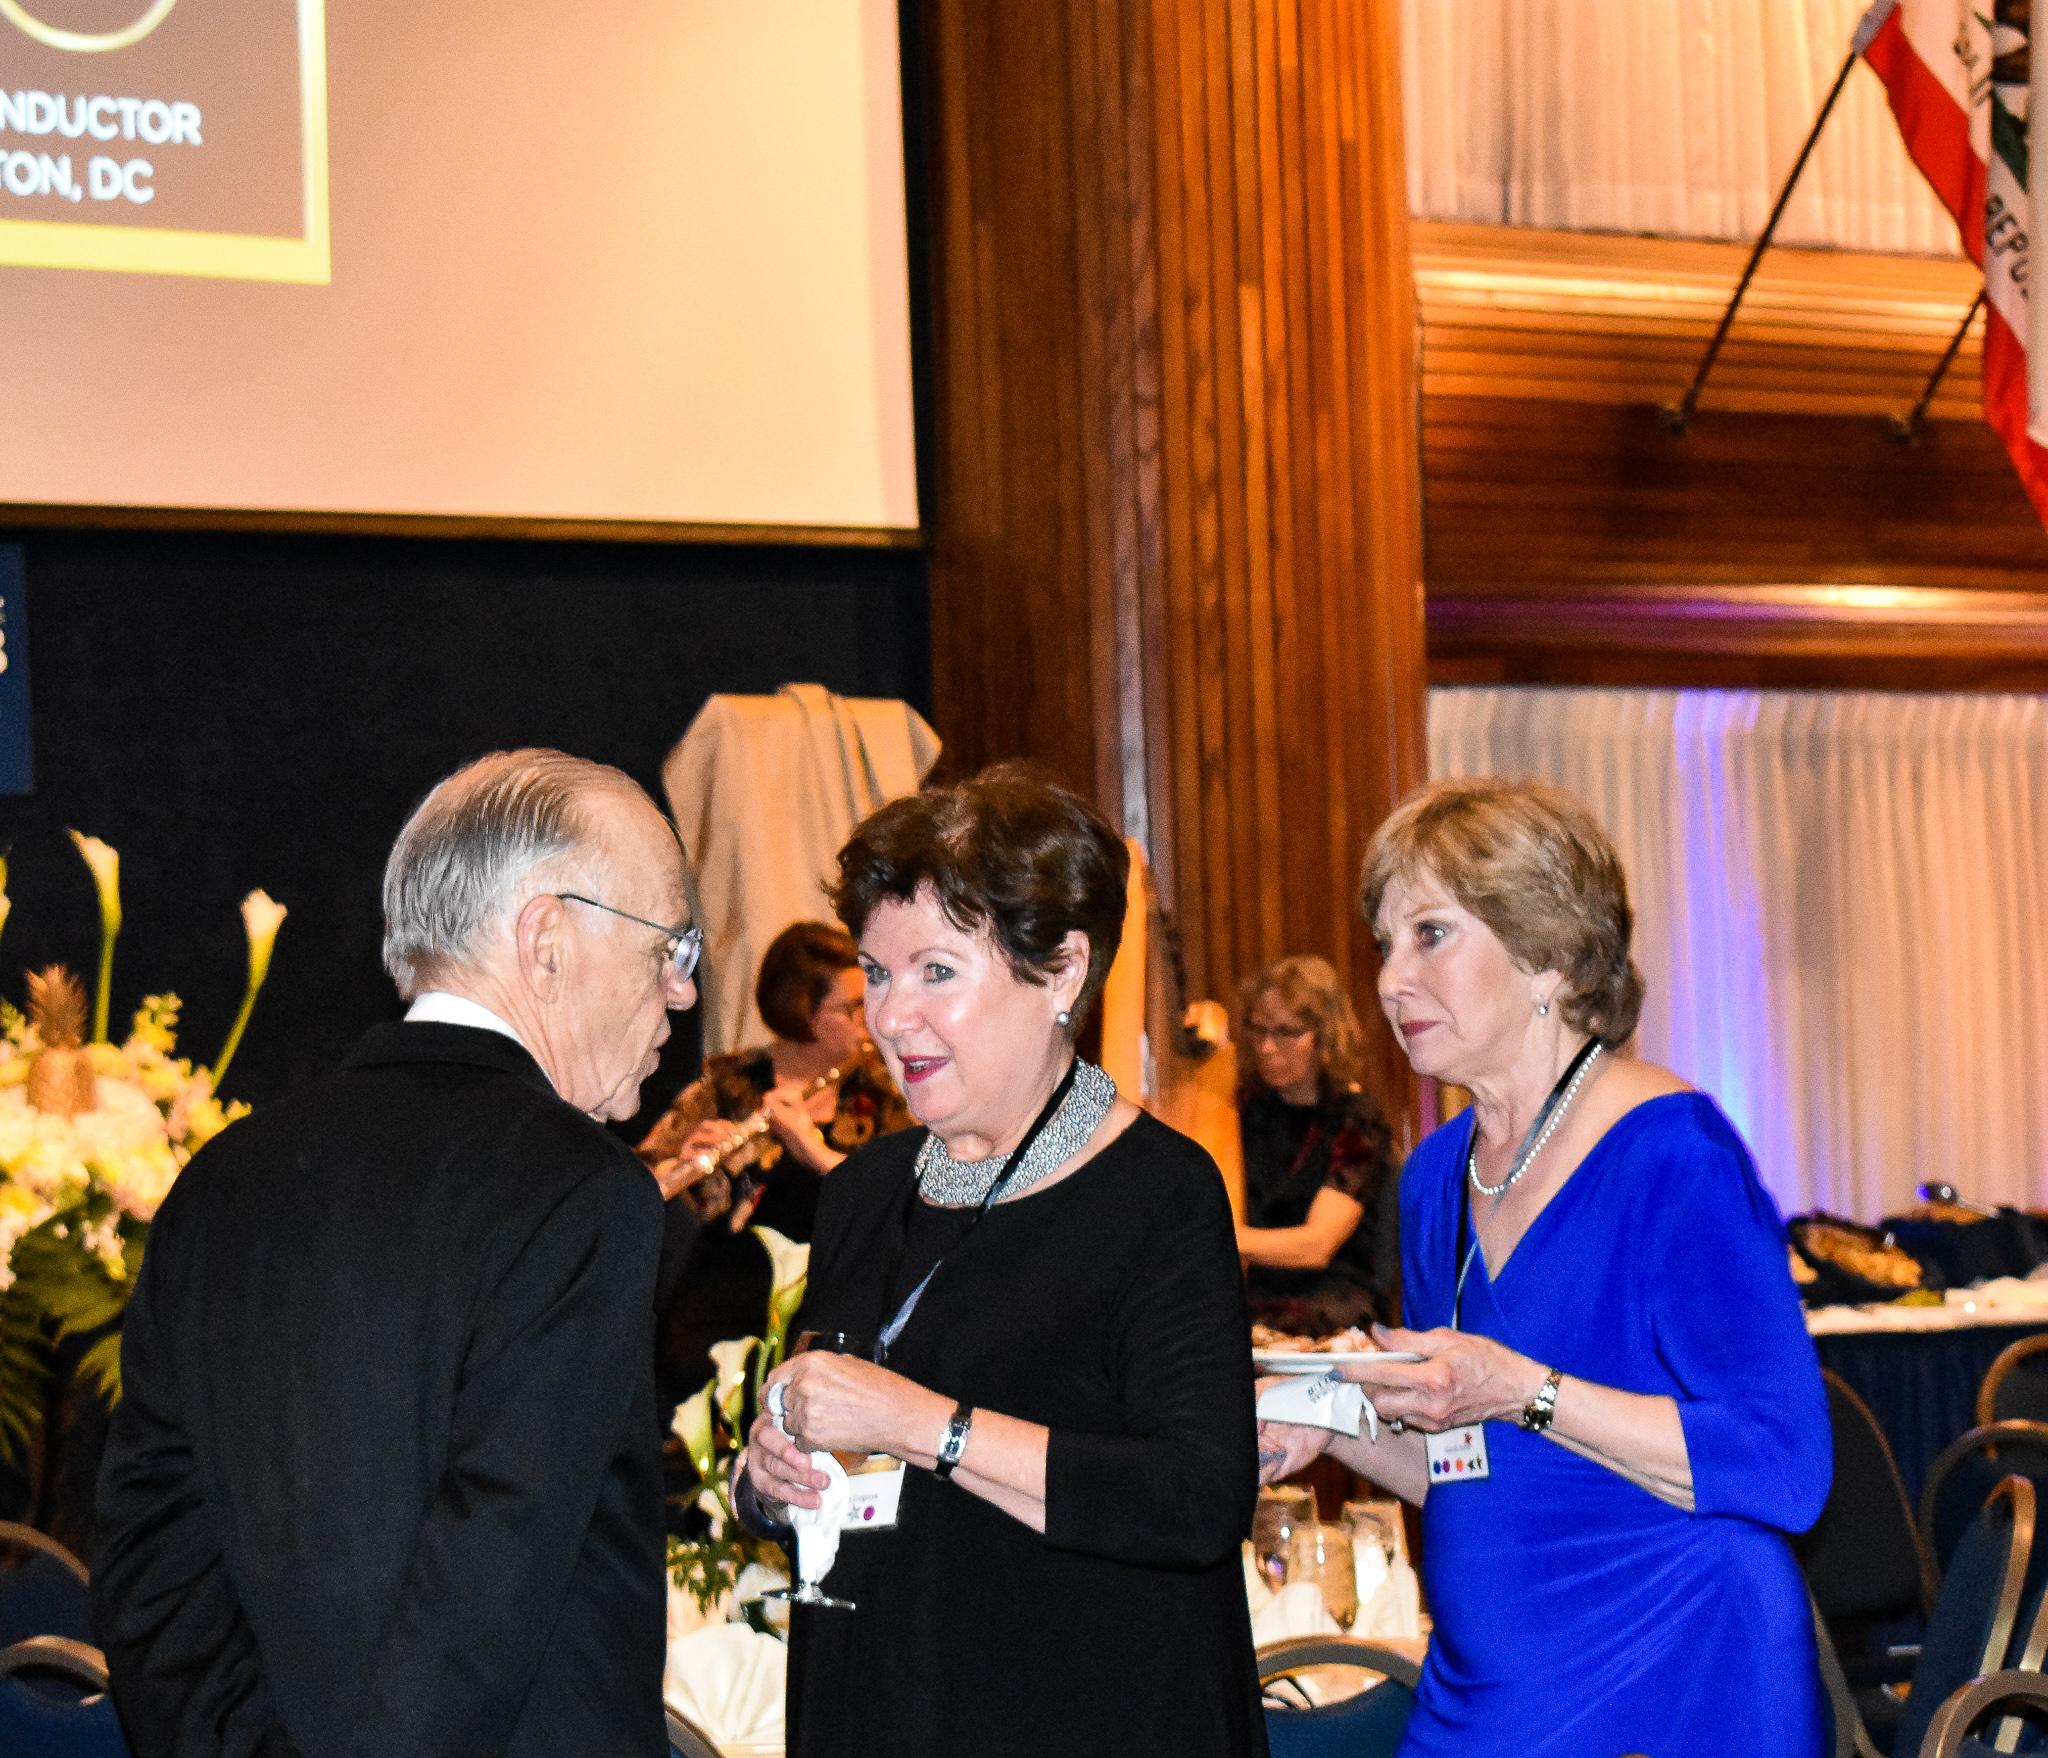 Bob Shafer, Joan Gregoryk & Glenda Finley